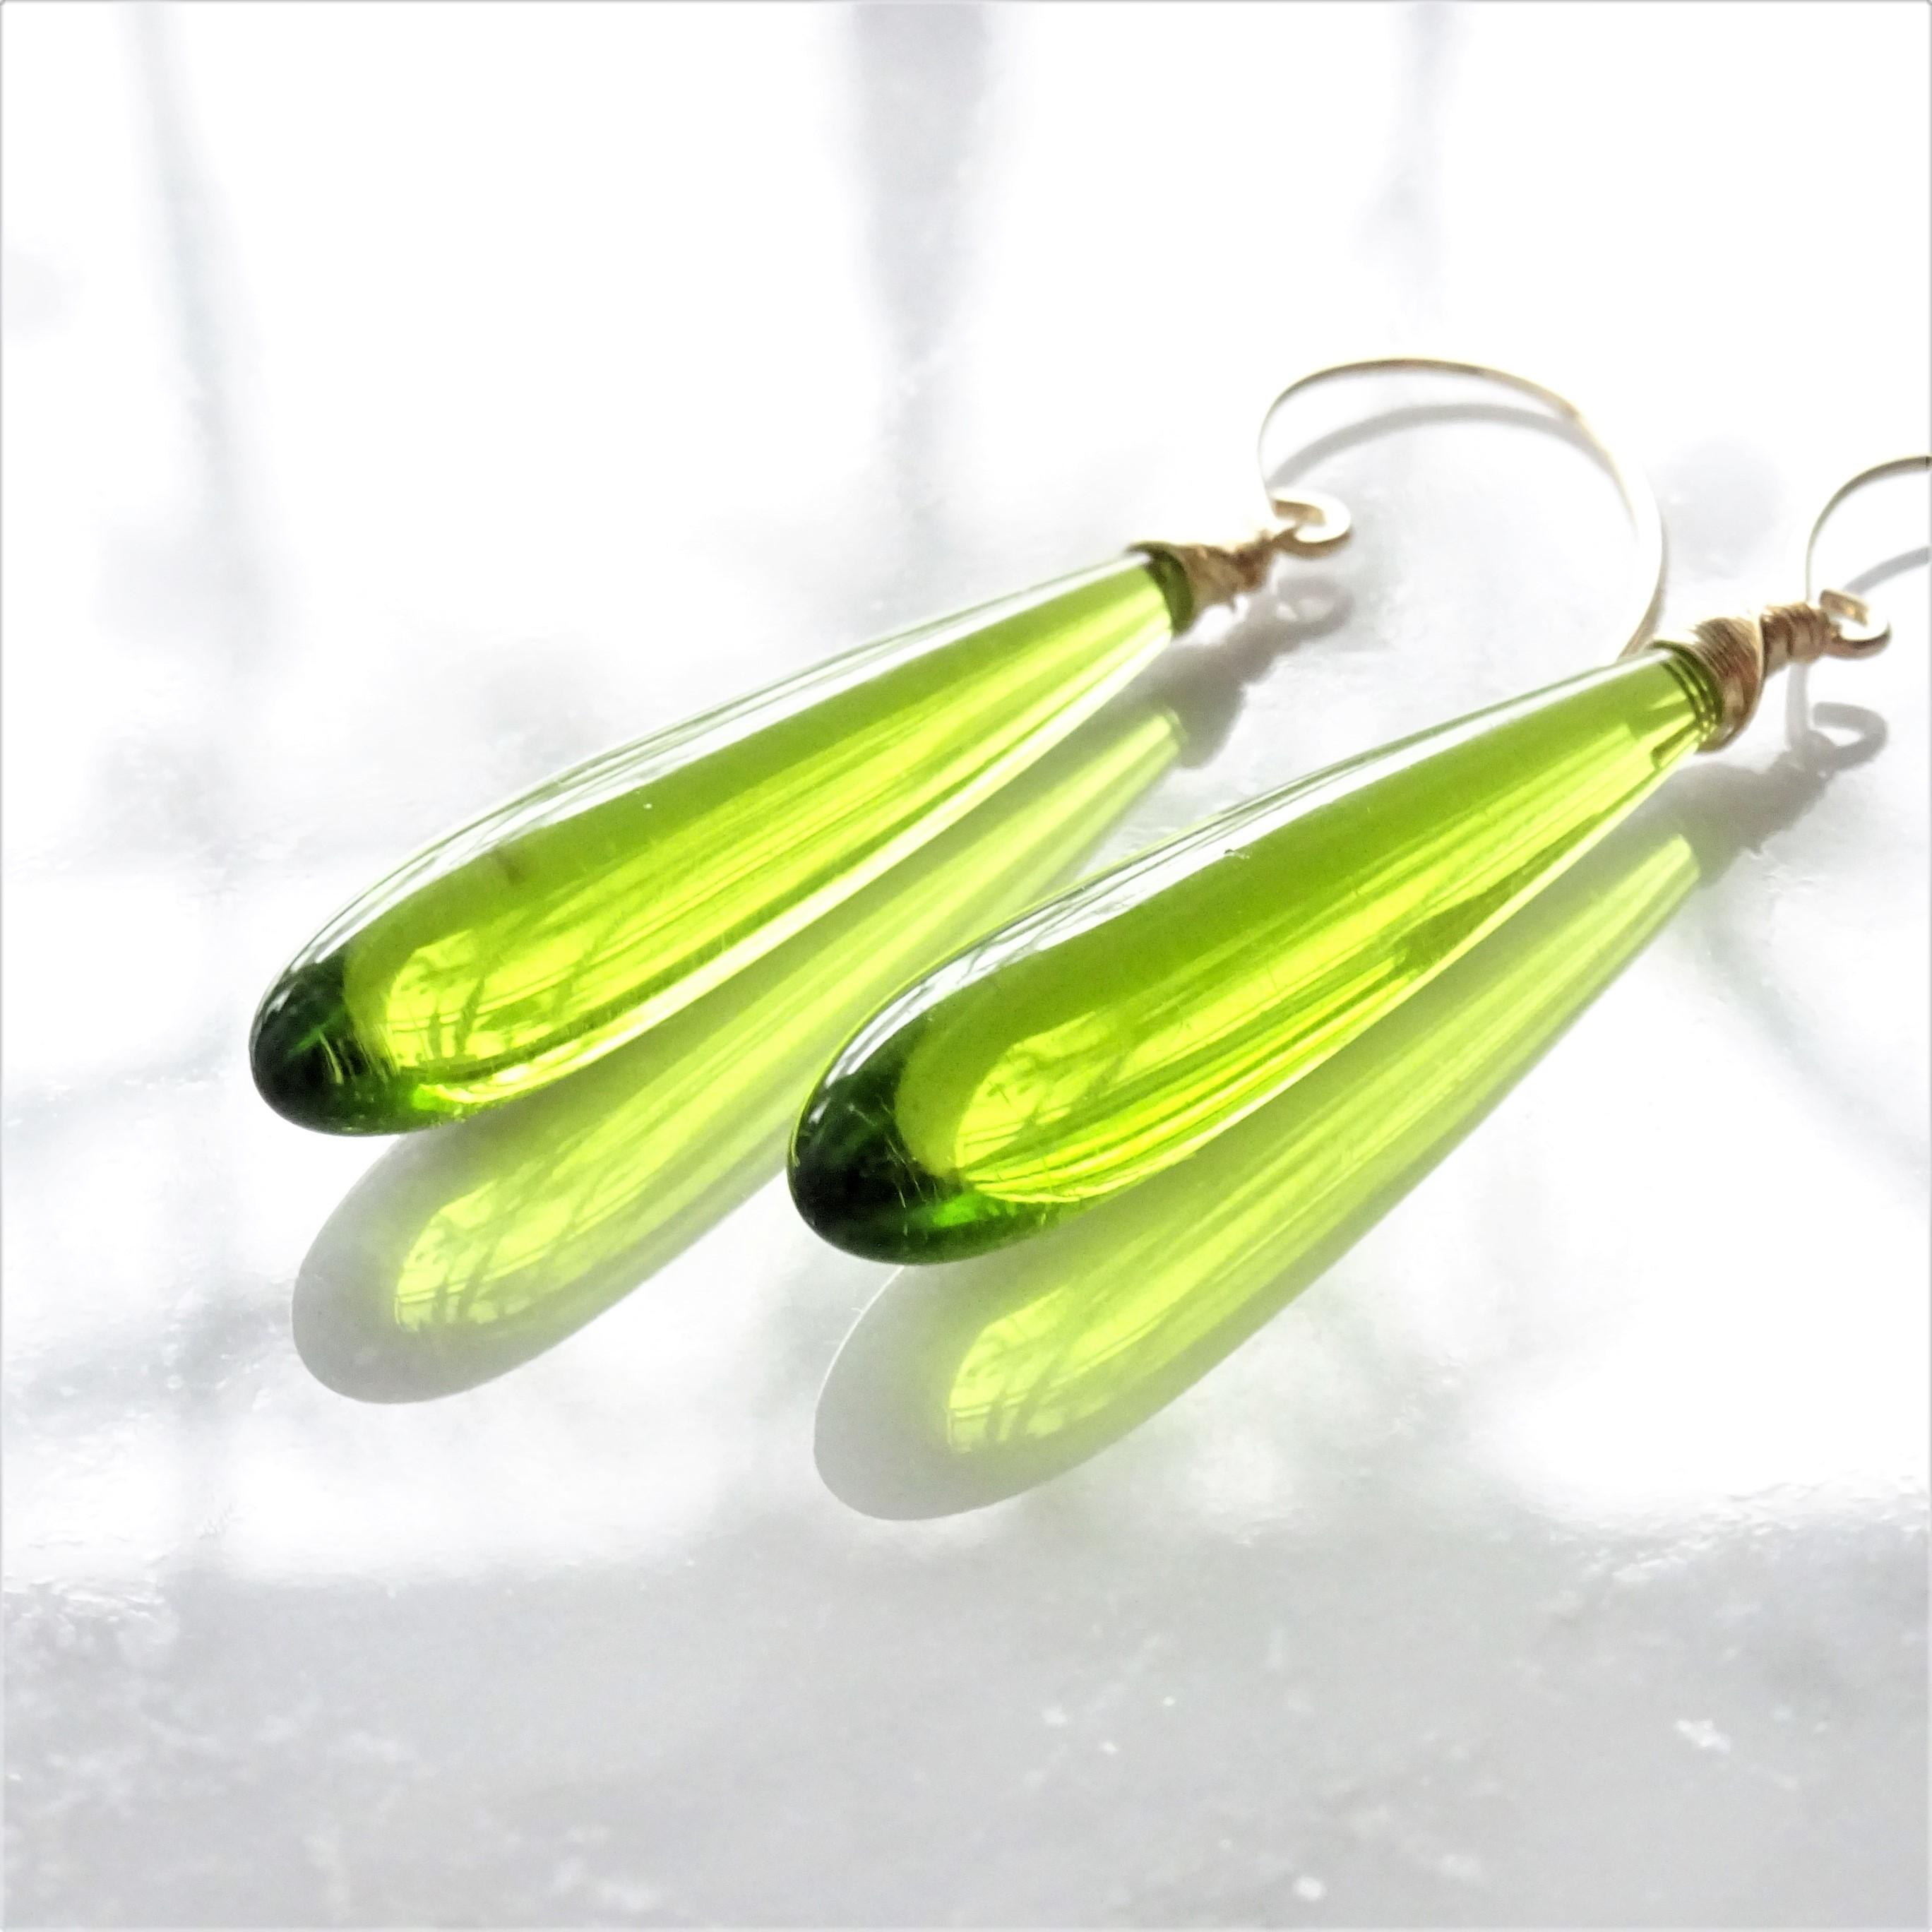 送料無料14kgf*Quartz drop pierced earring / earring RIGHT GREEN